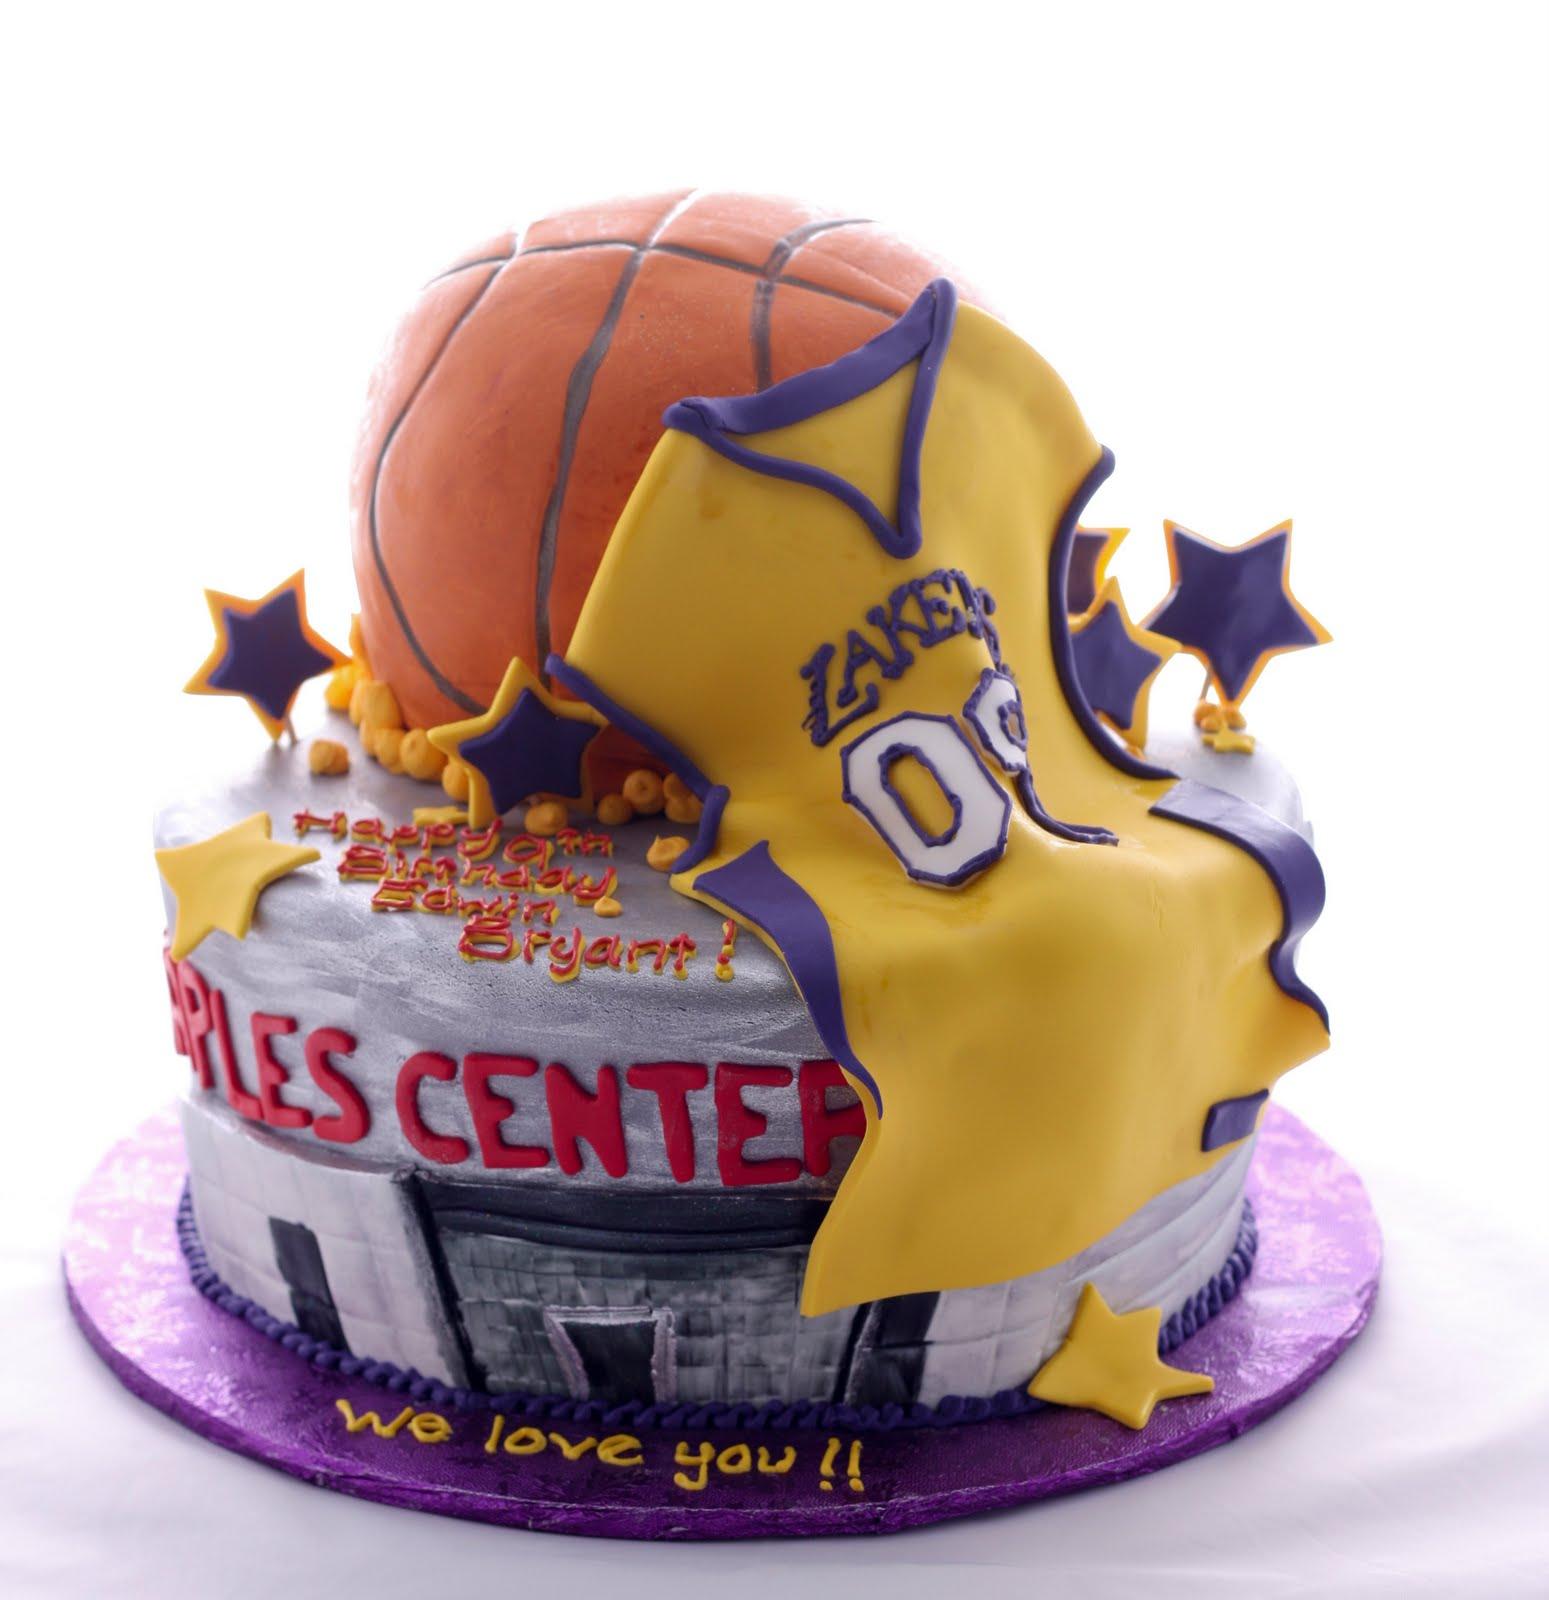 The Crimson Cake Blog Lakers Stapes Center Cake